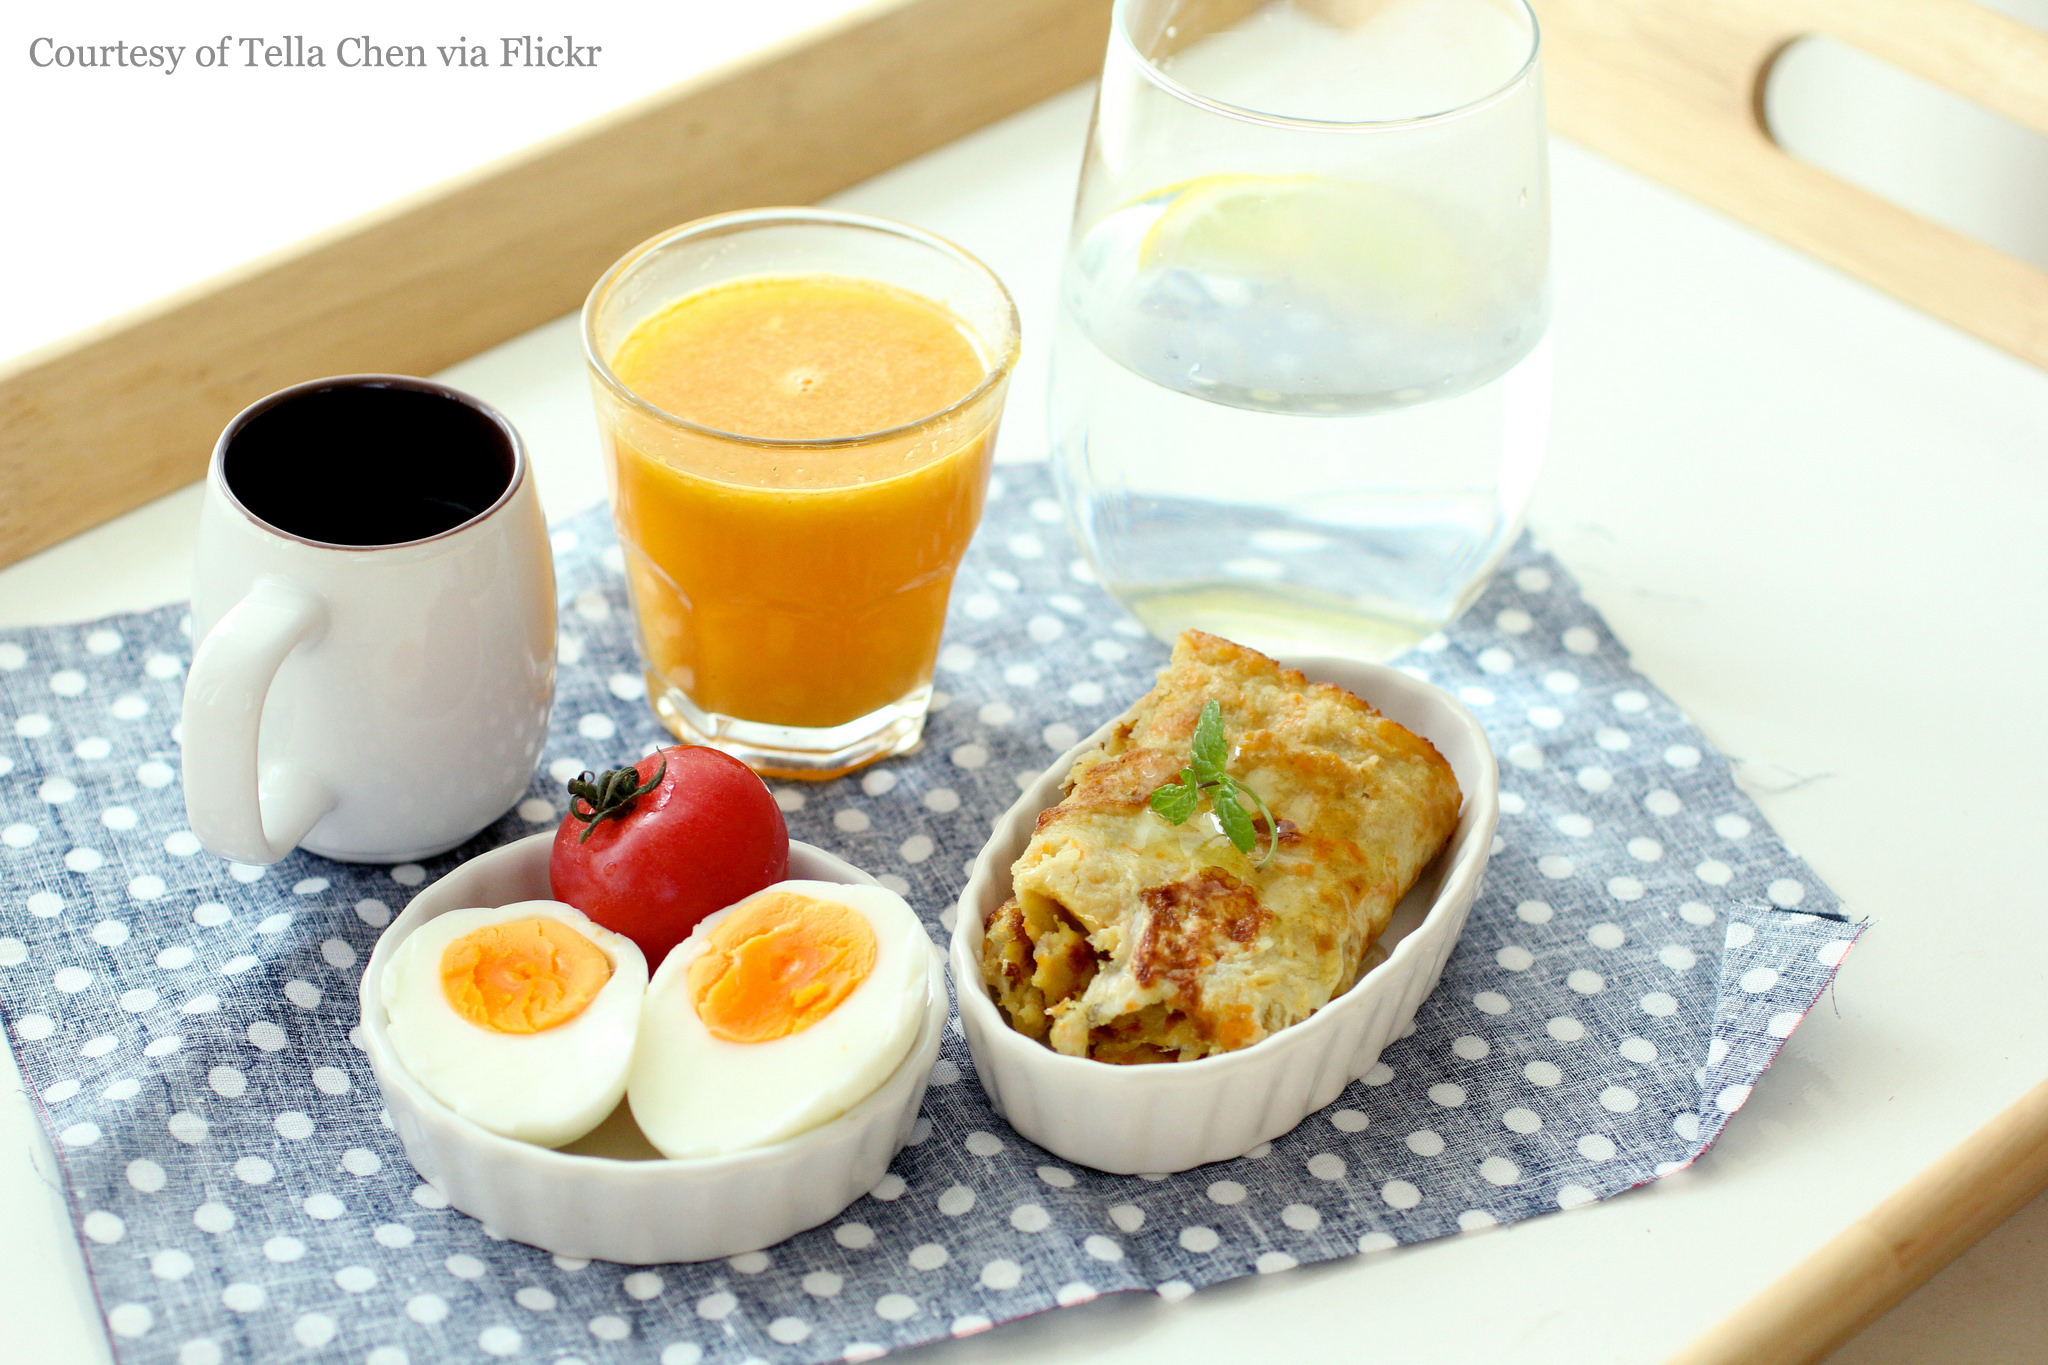 A healthy breakfast on display